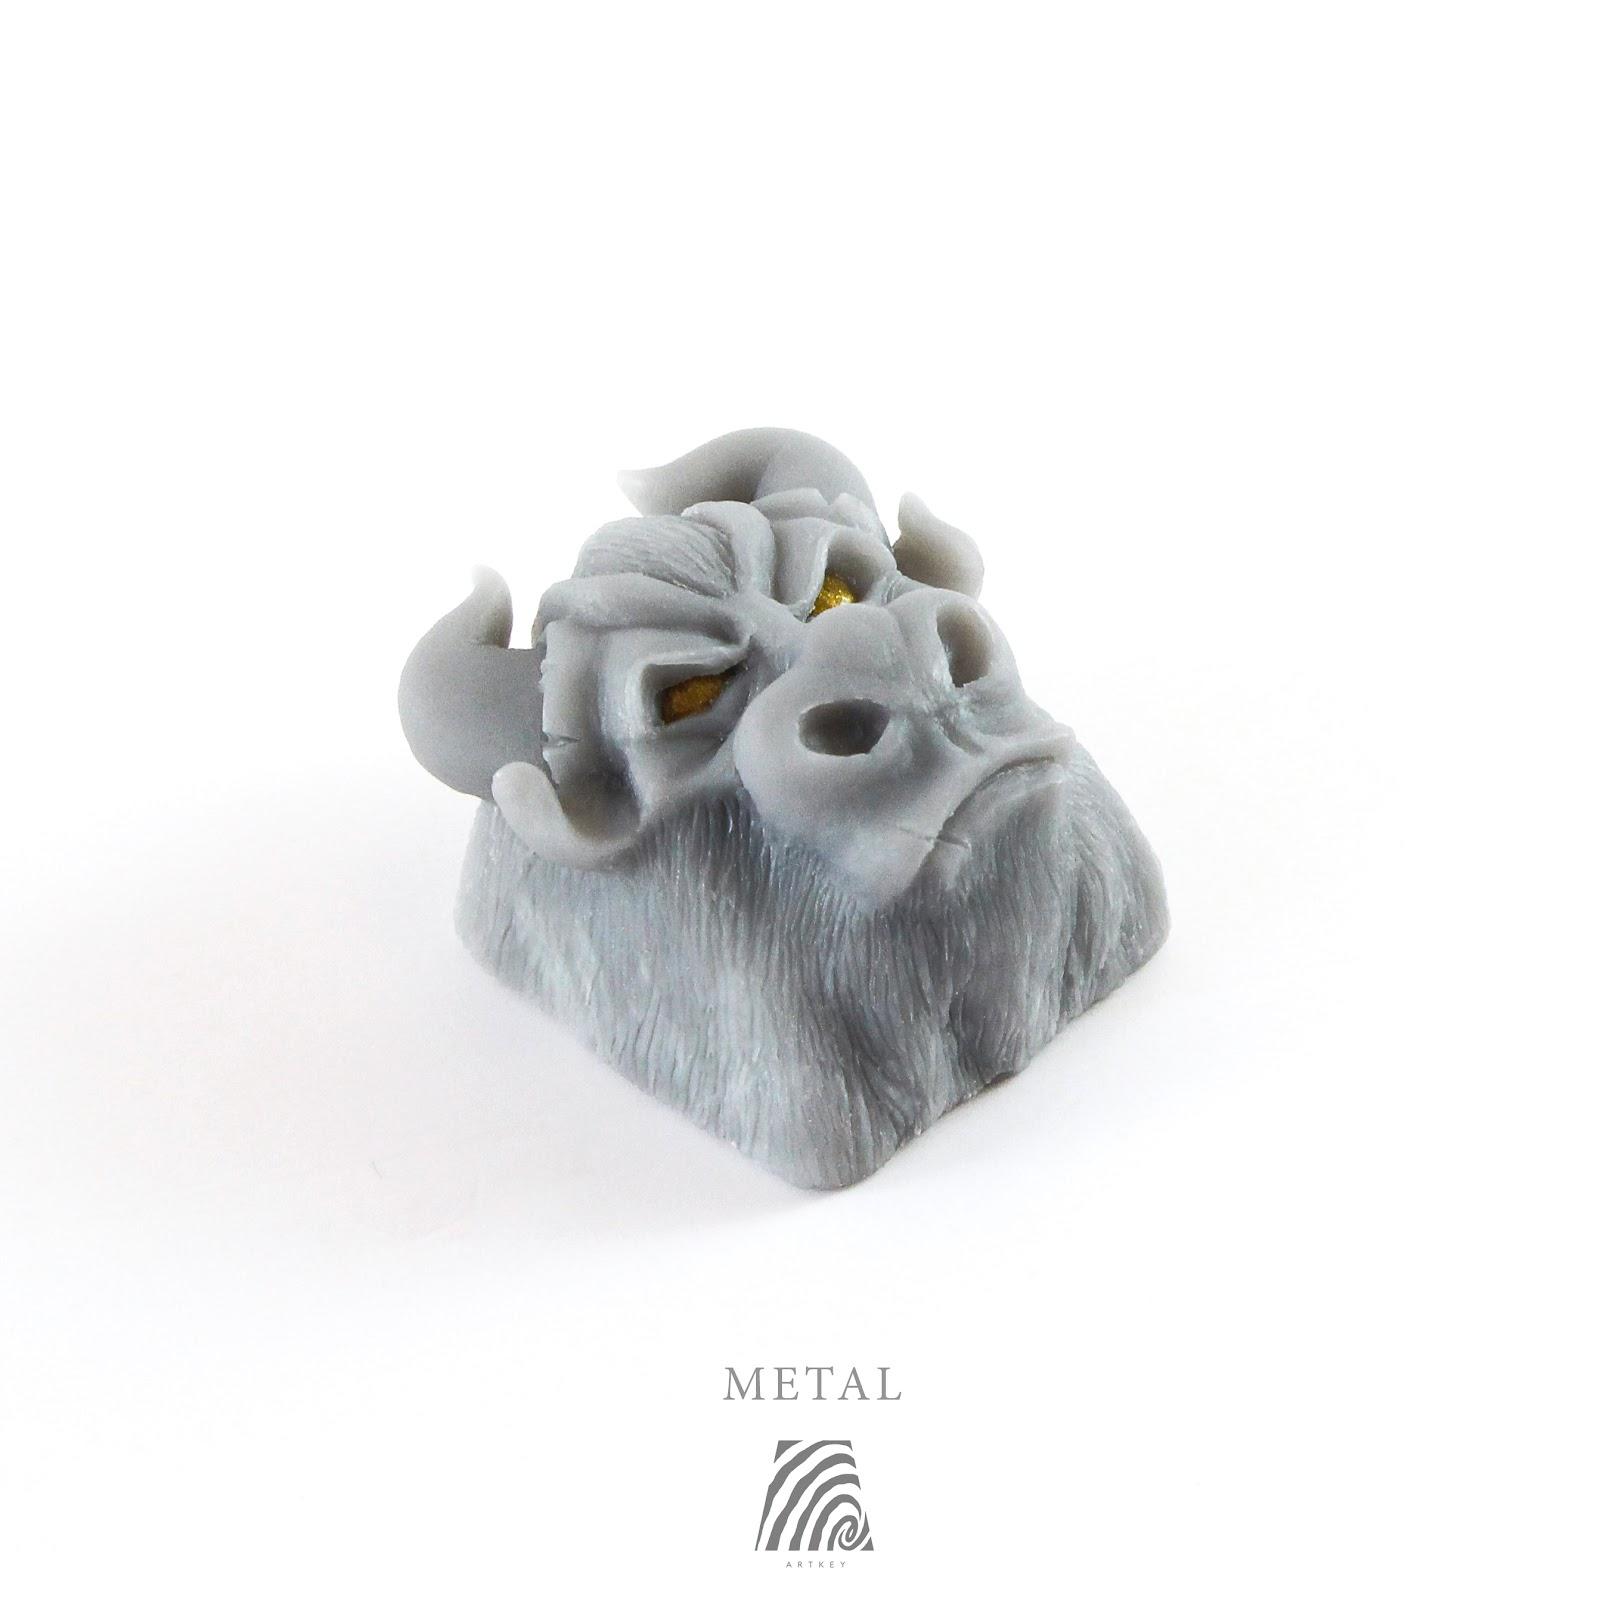 Artkey - Metal Bull